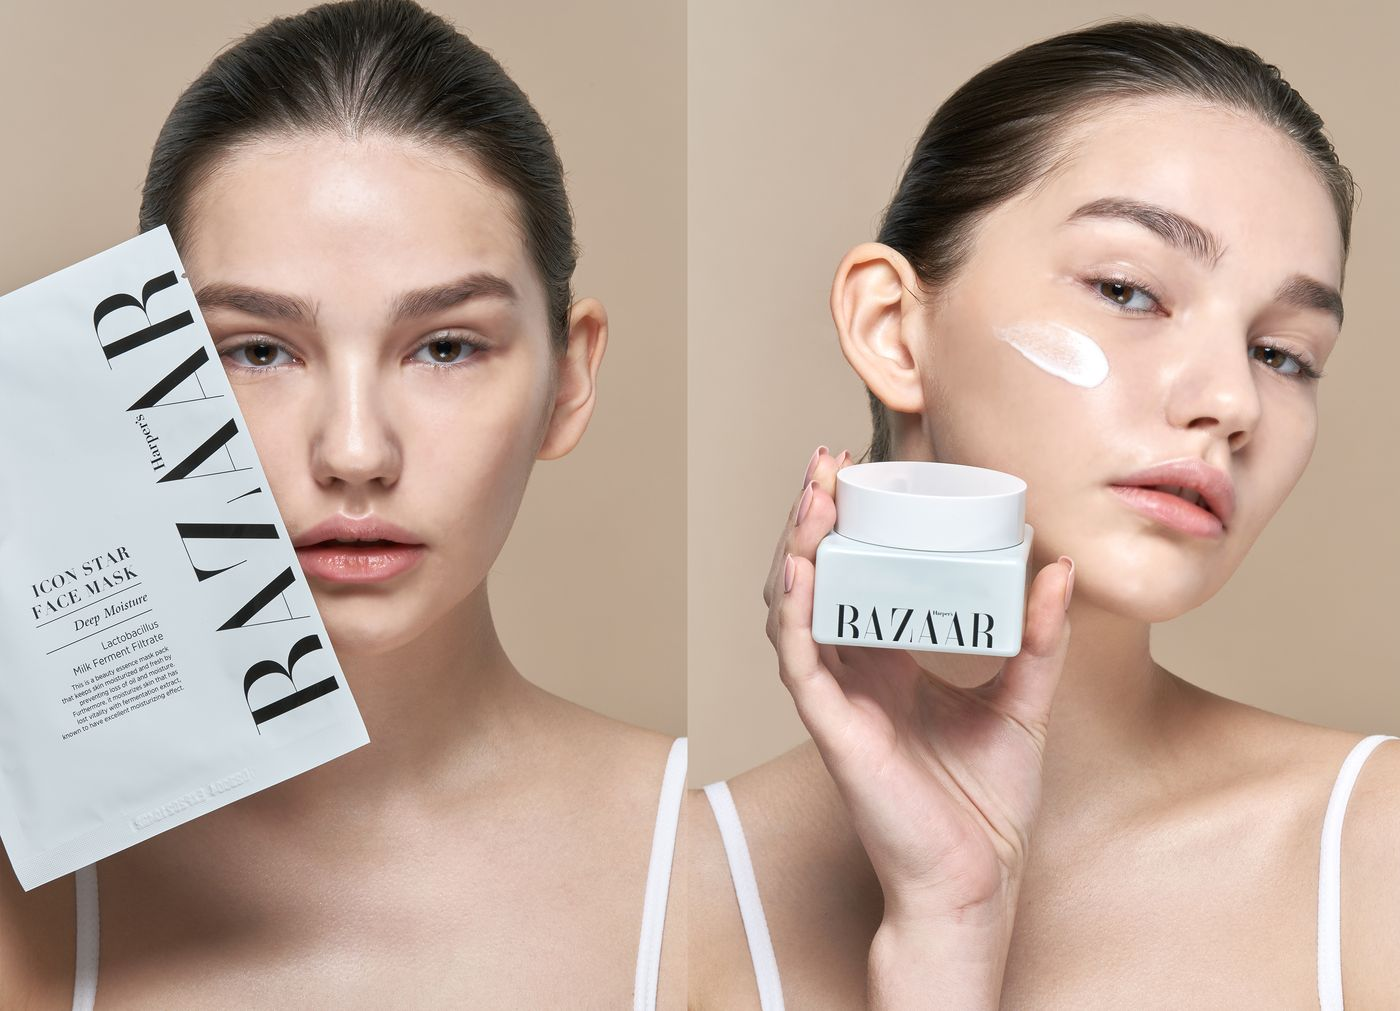 Harpers Bazaar Skincare Collection